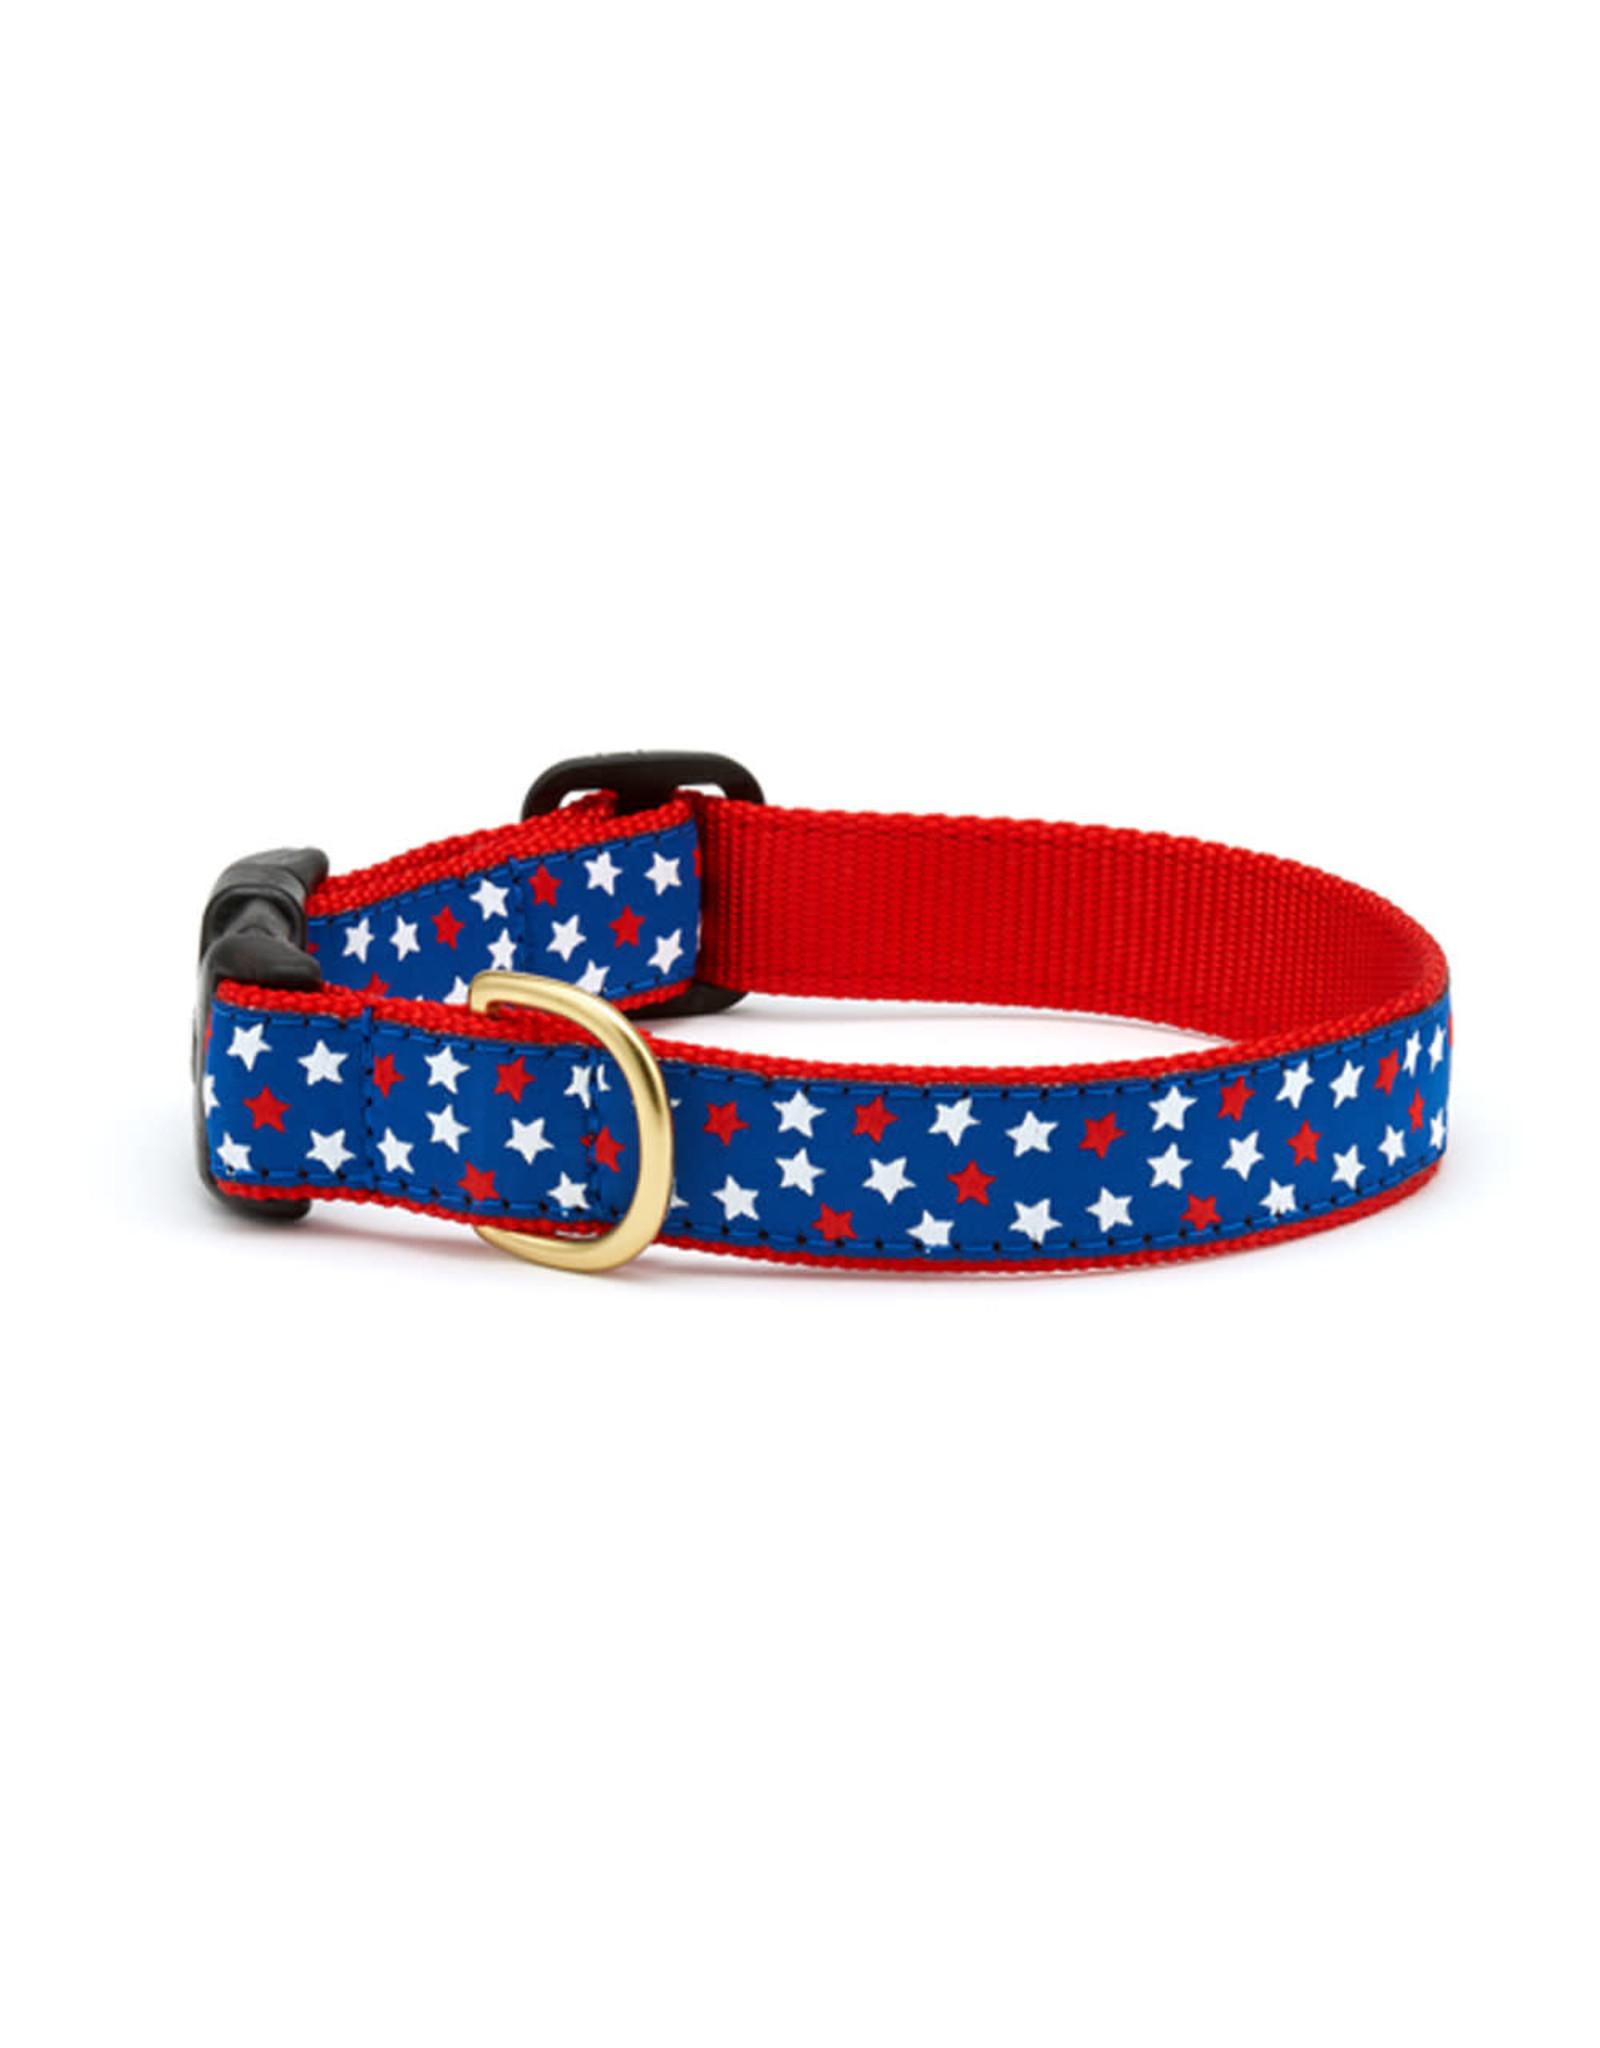 Up Country Stars Collar: Narrow, S